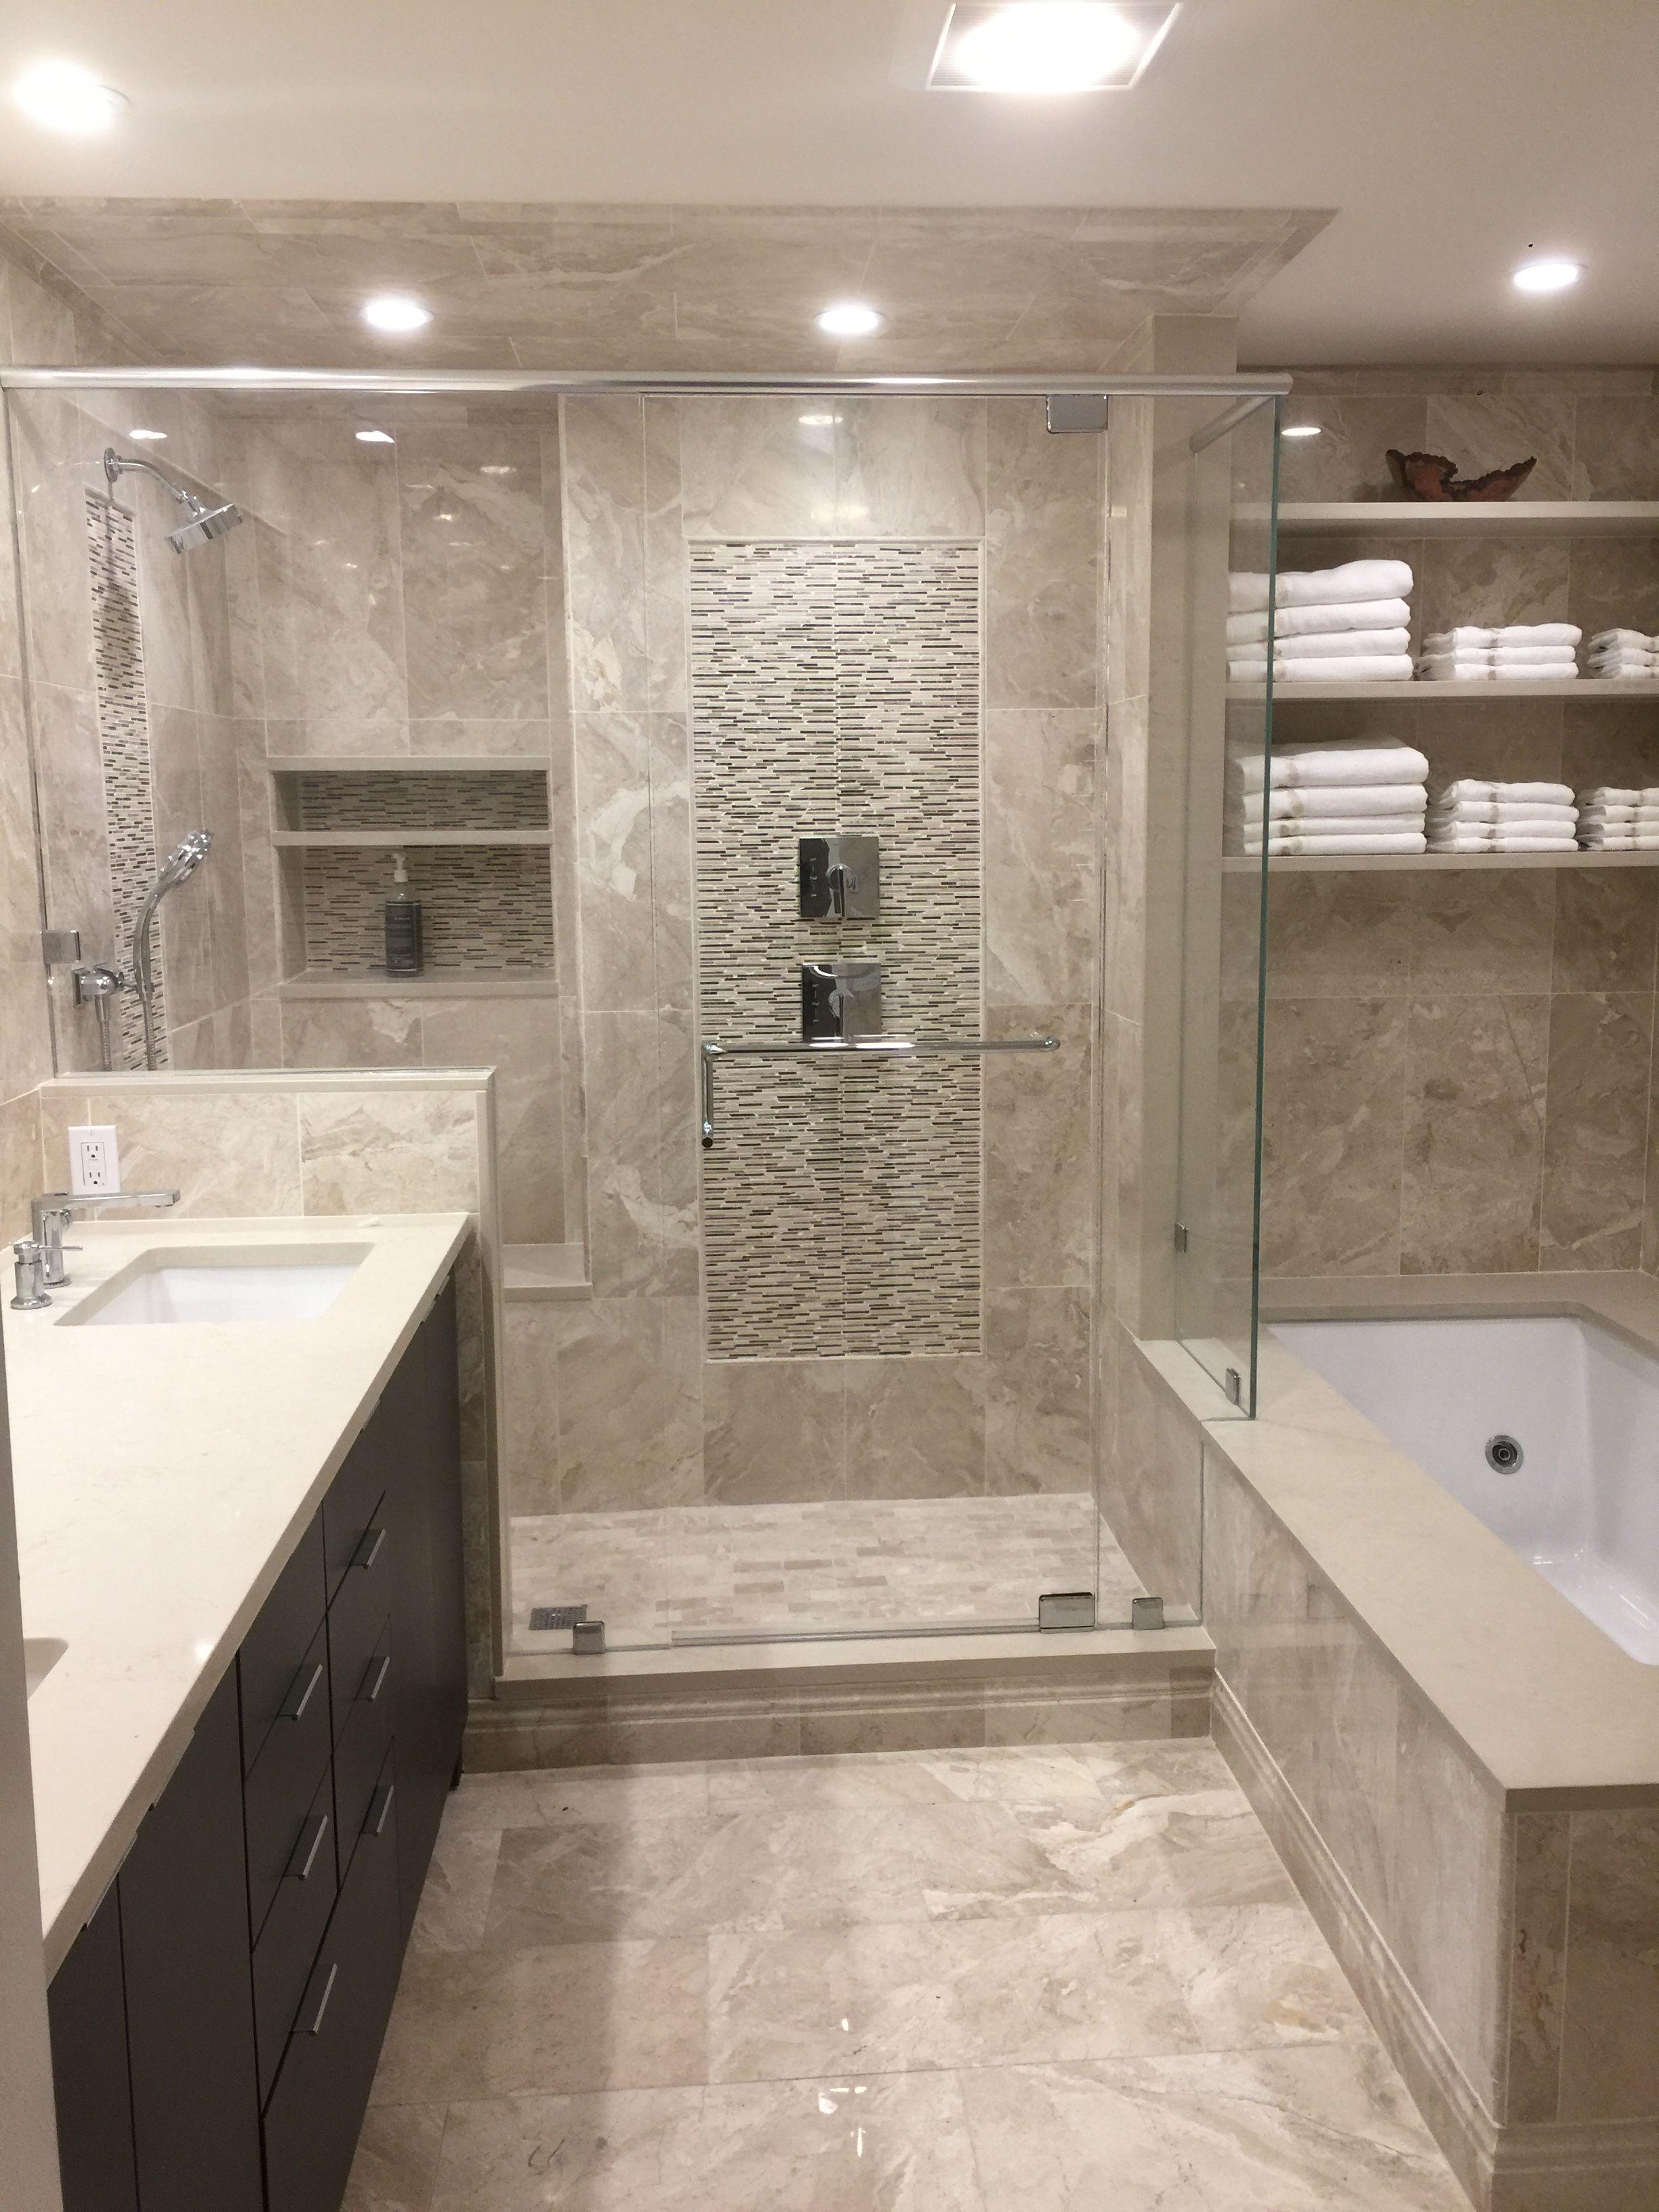 Diana Royale Marble Tile And Cream Of Marfil Quartz Marble Bathroom Beautiful Tile Bathroom Bathroom Design Inspiration